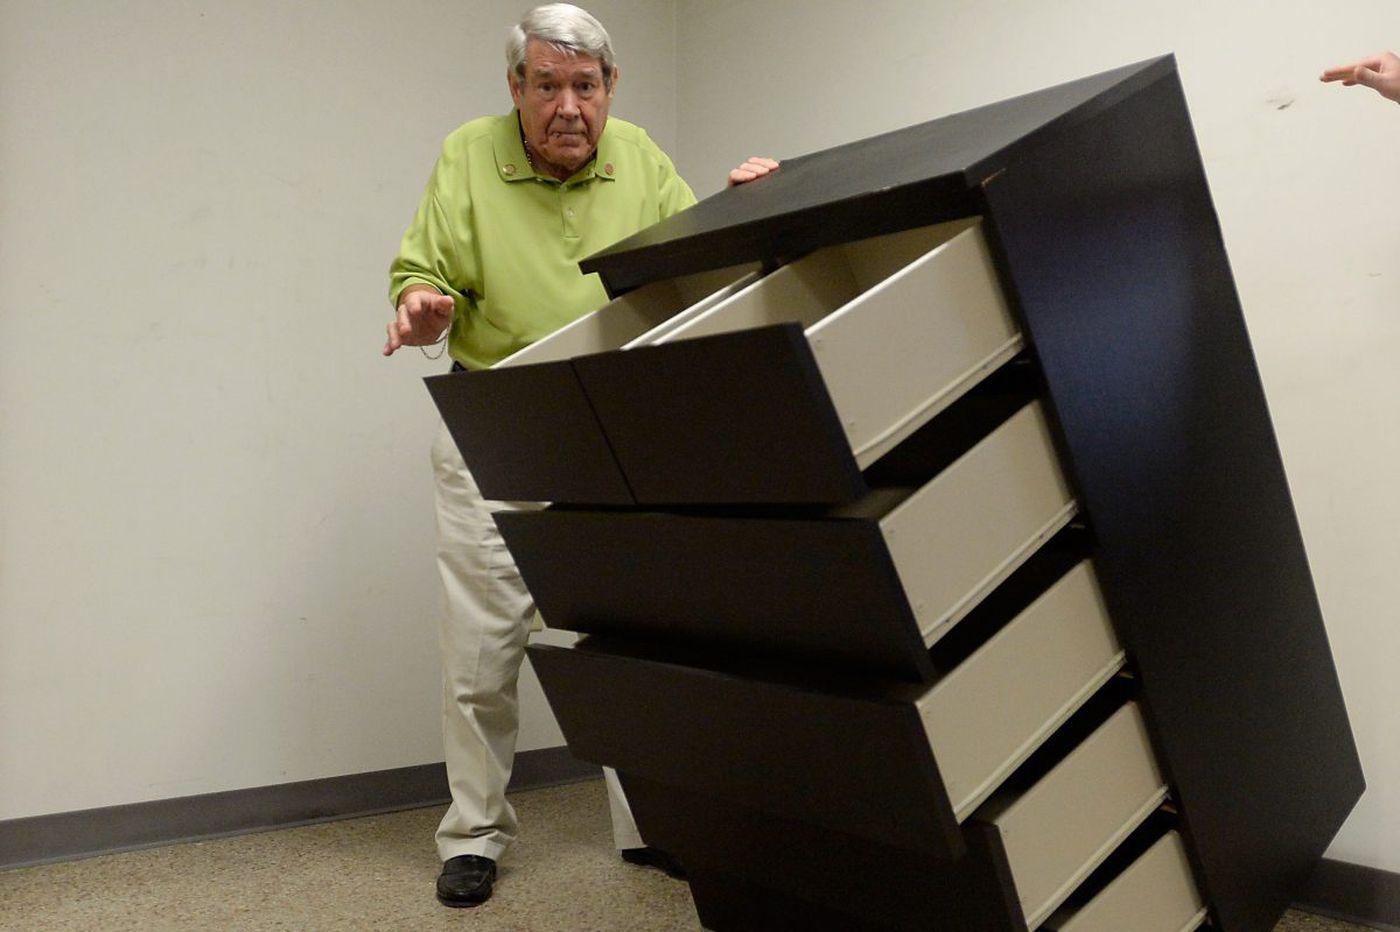 Ikea dresser recall falling short, safety advocates warn